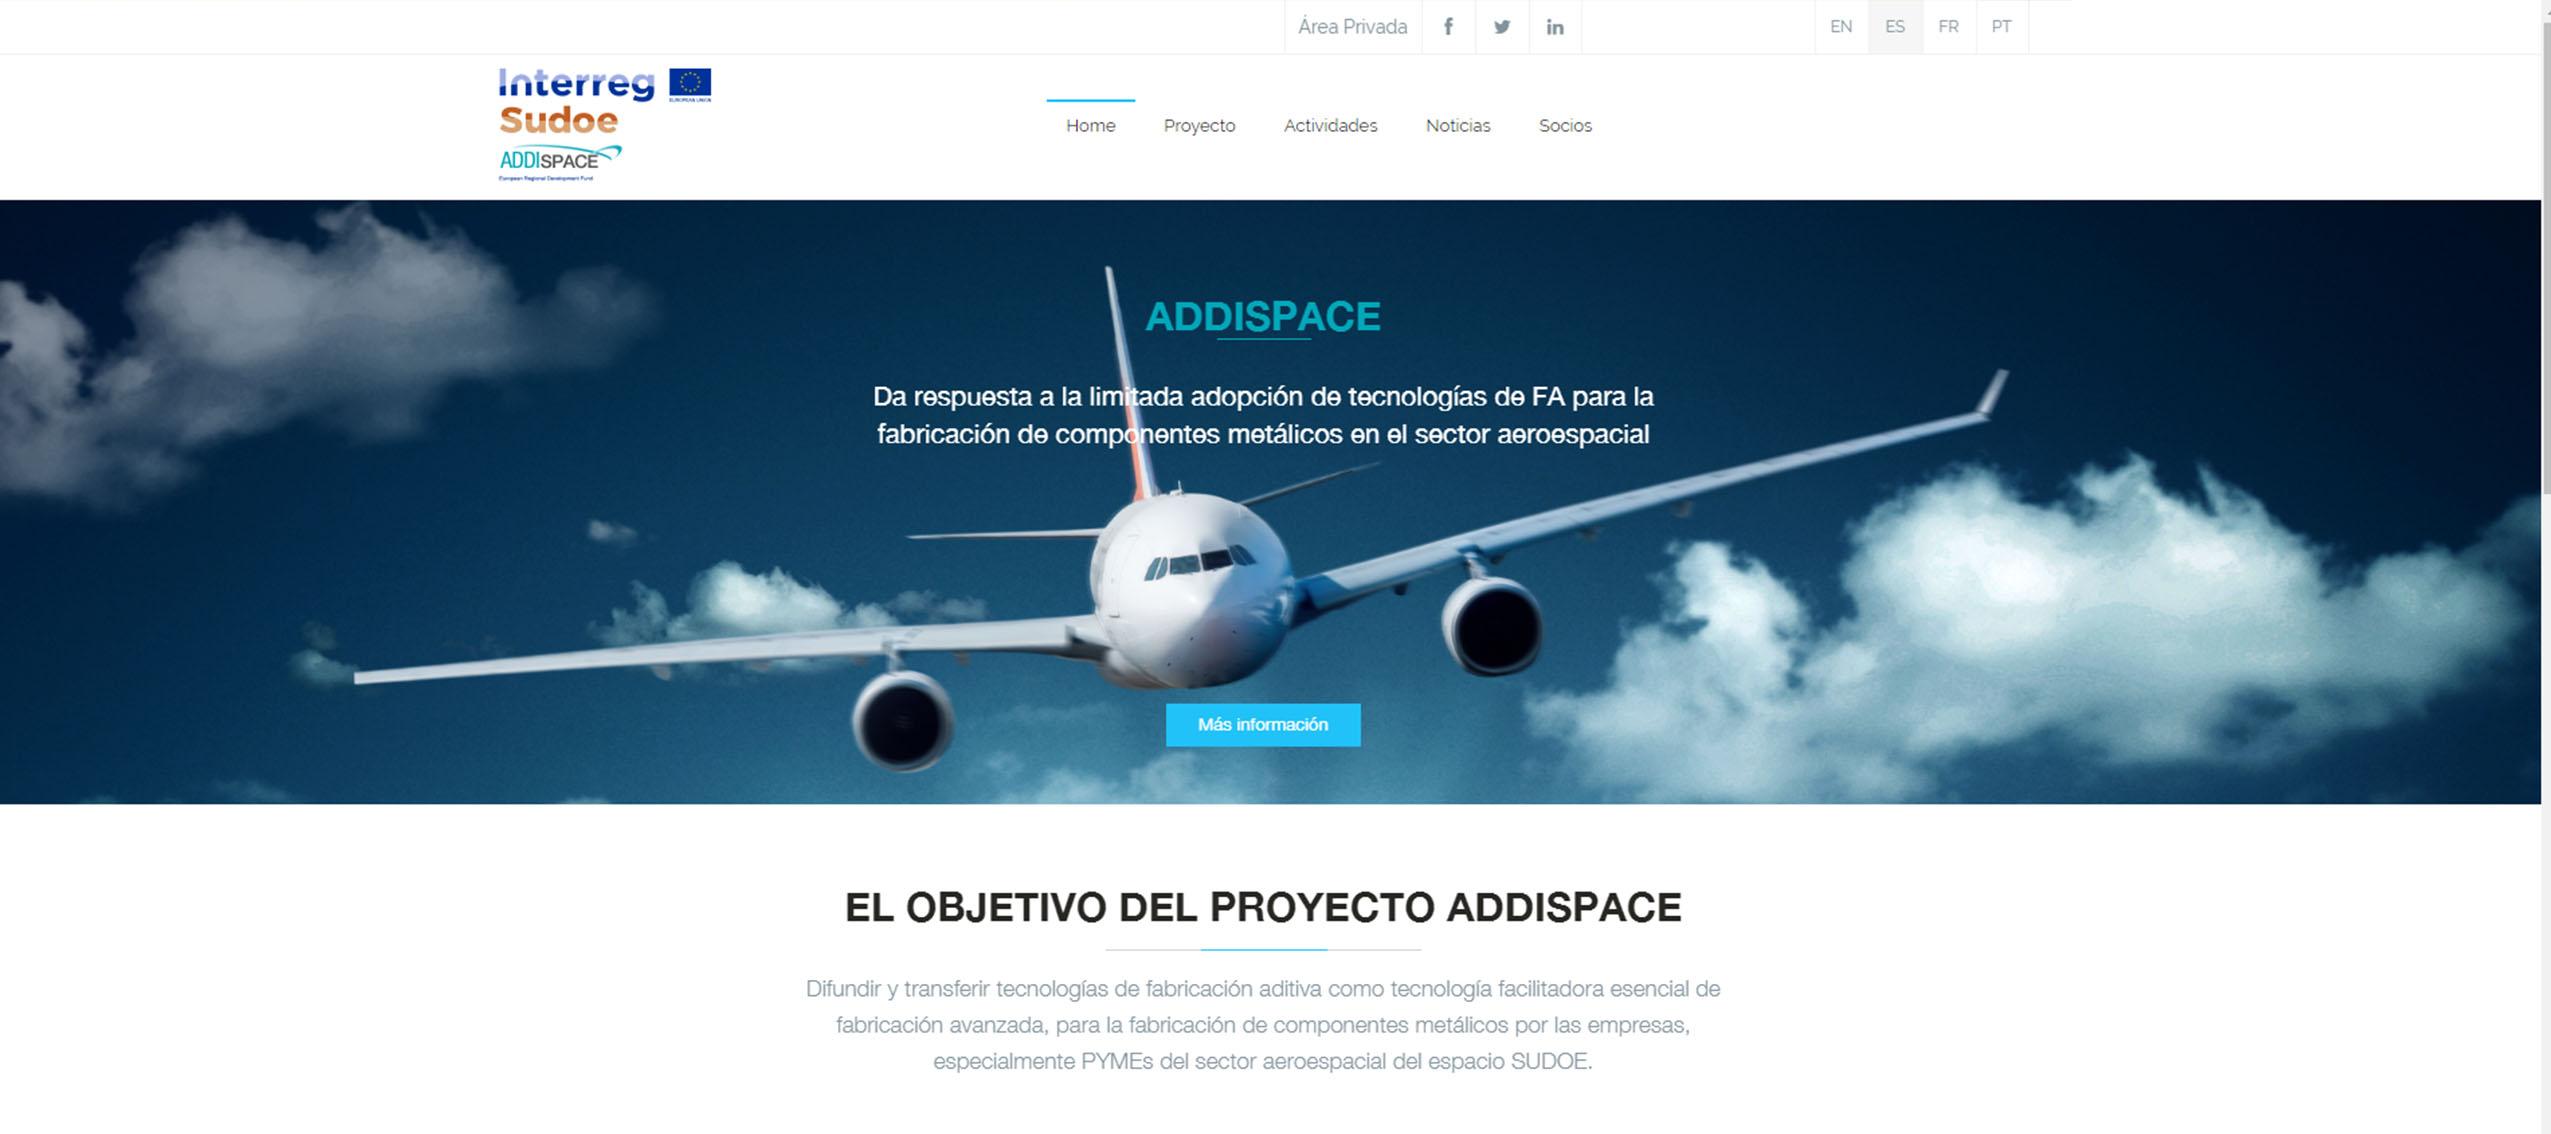 ADDISPACE estrena página web